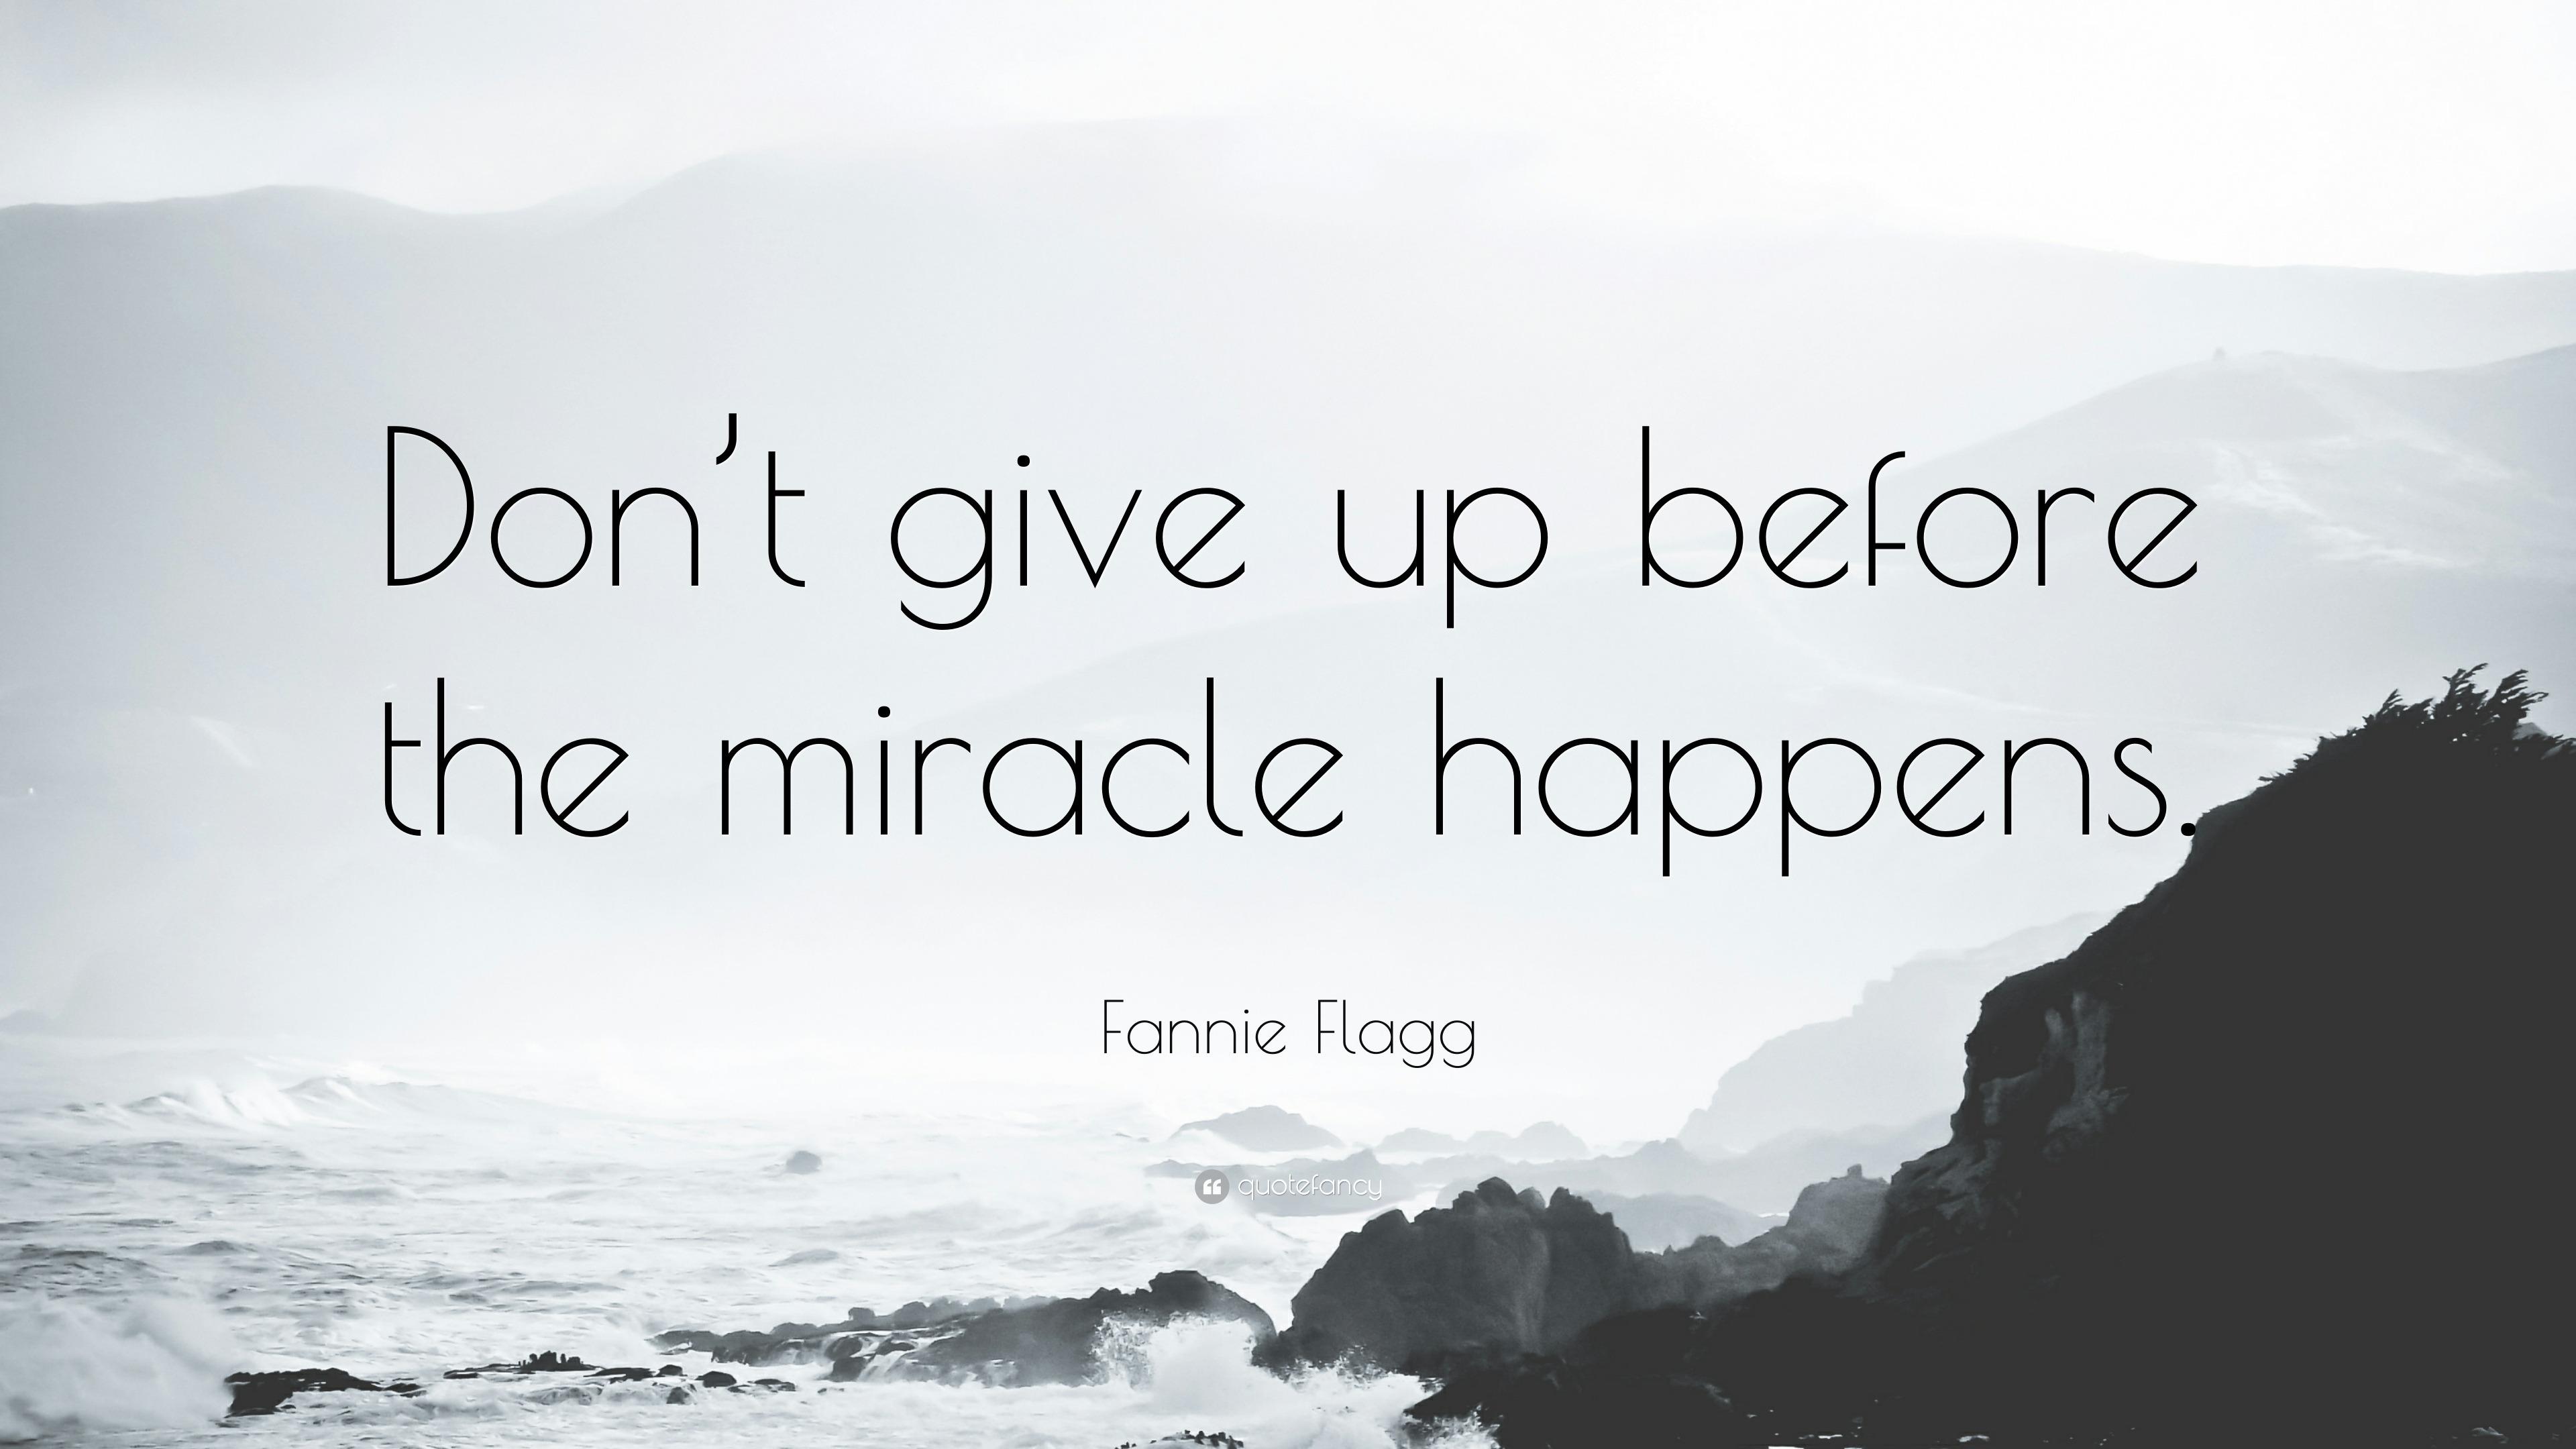 Pildiotsingu don't give up before the miracle happens tulemus